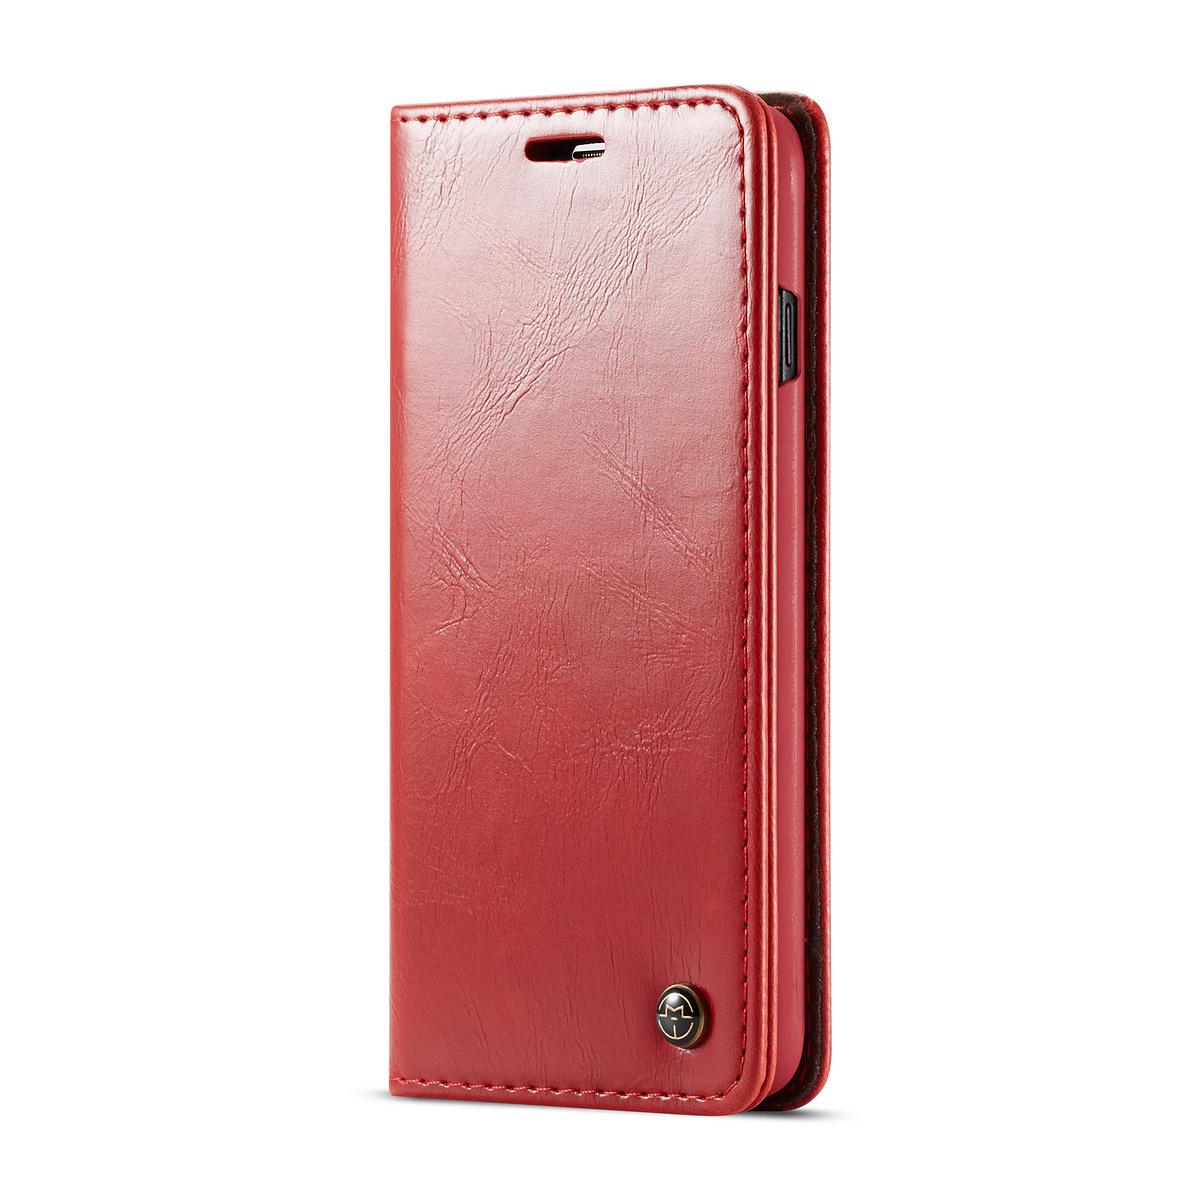 CaseMe läderfodral, ställ, Samsung Galaxy S10 Plus, röd